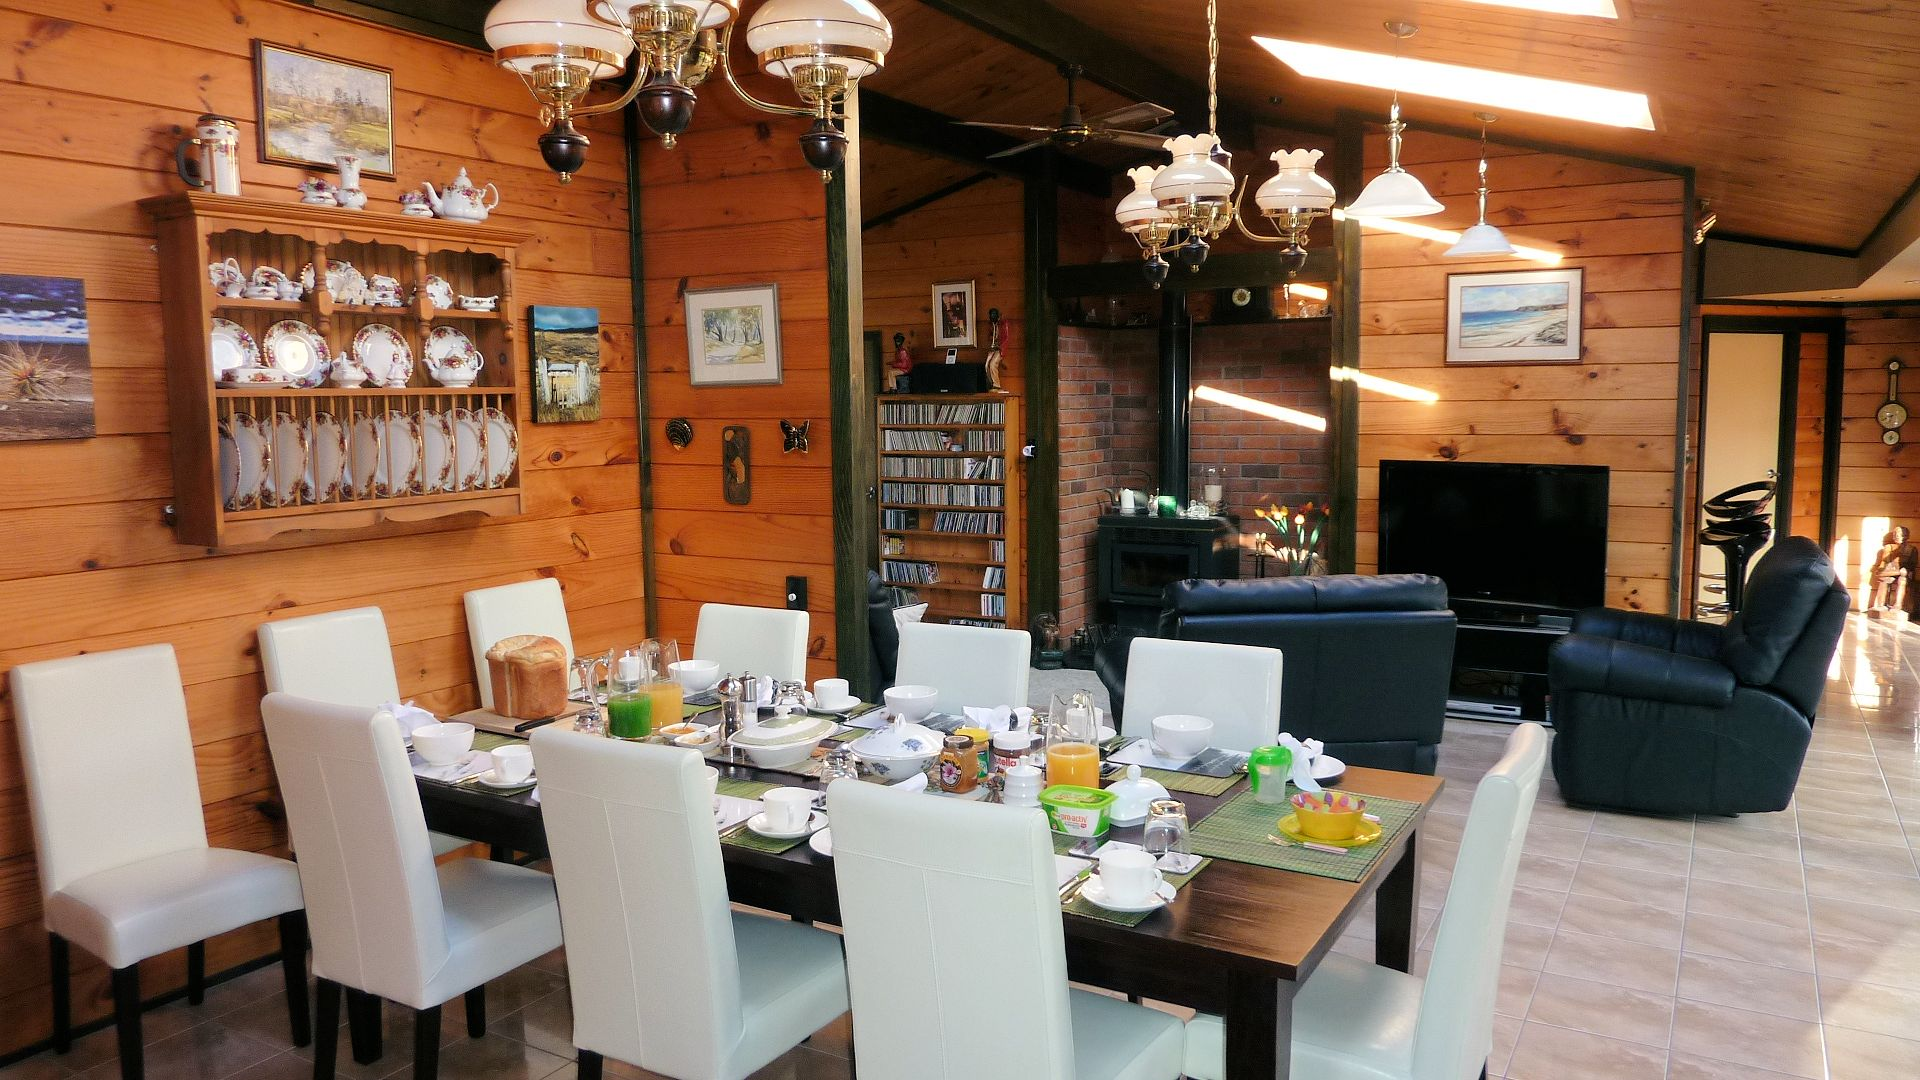 The breakfast area at Mokioa Downs.